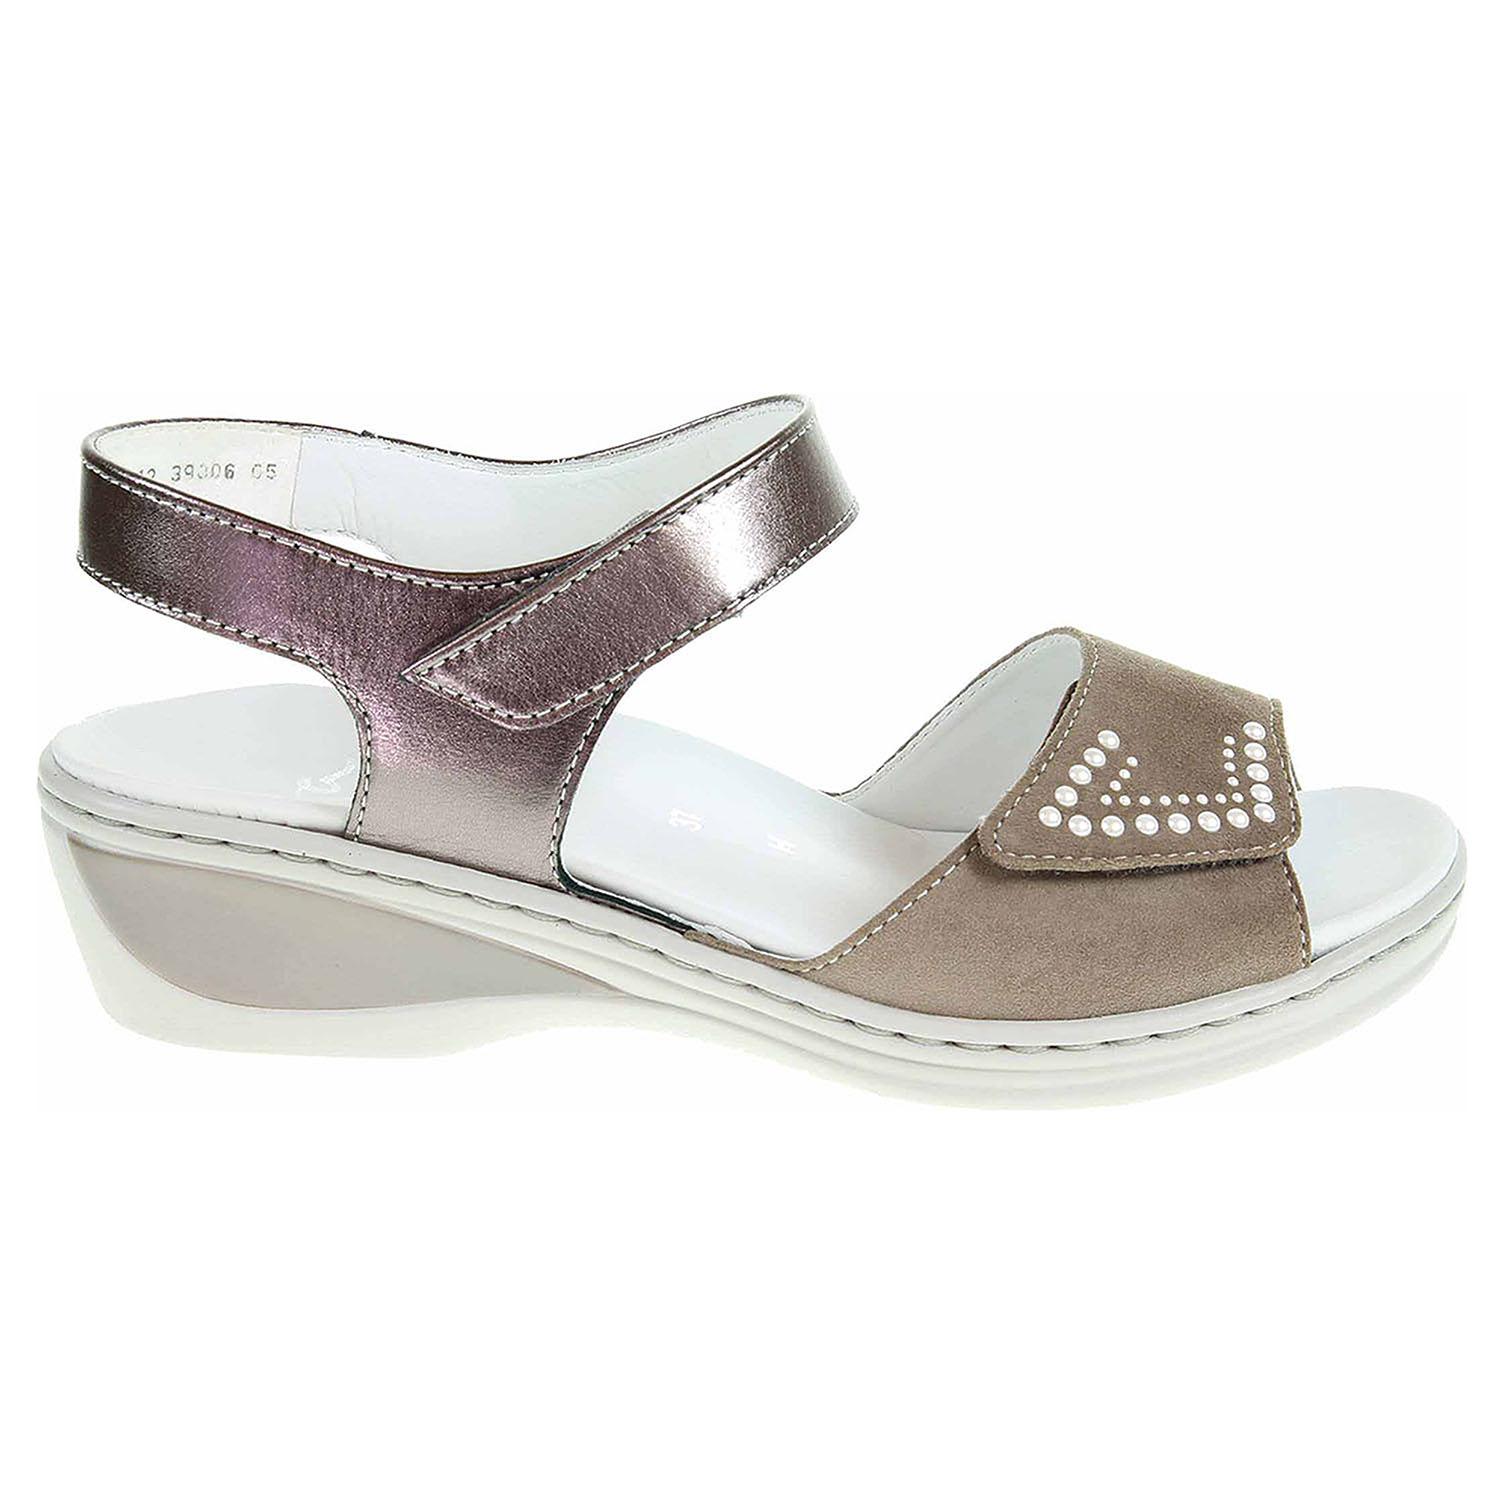 Ecco Ara dámské sandály 12-39006-05 taupe-street 23801280